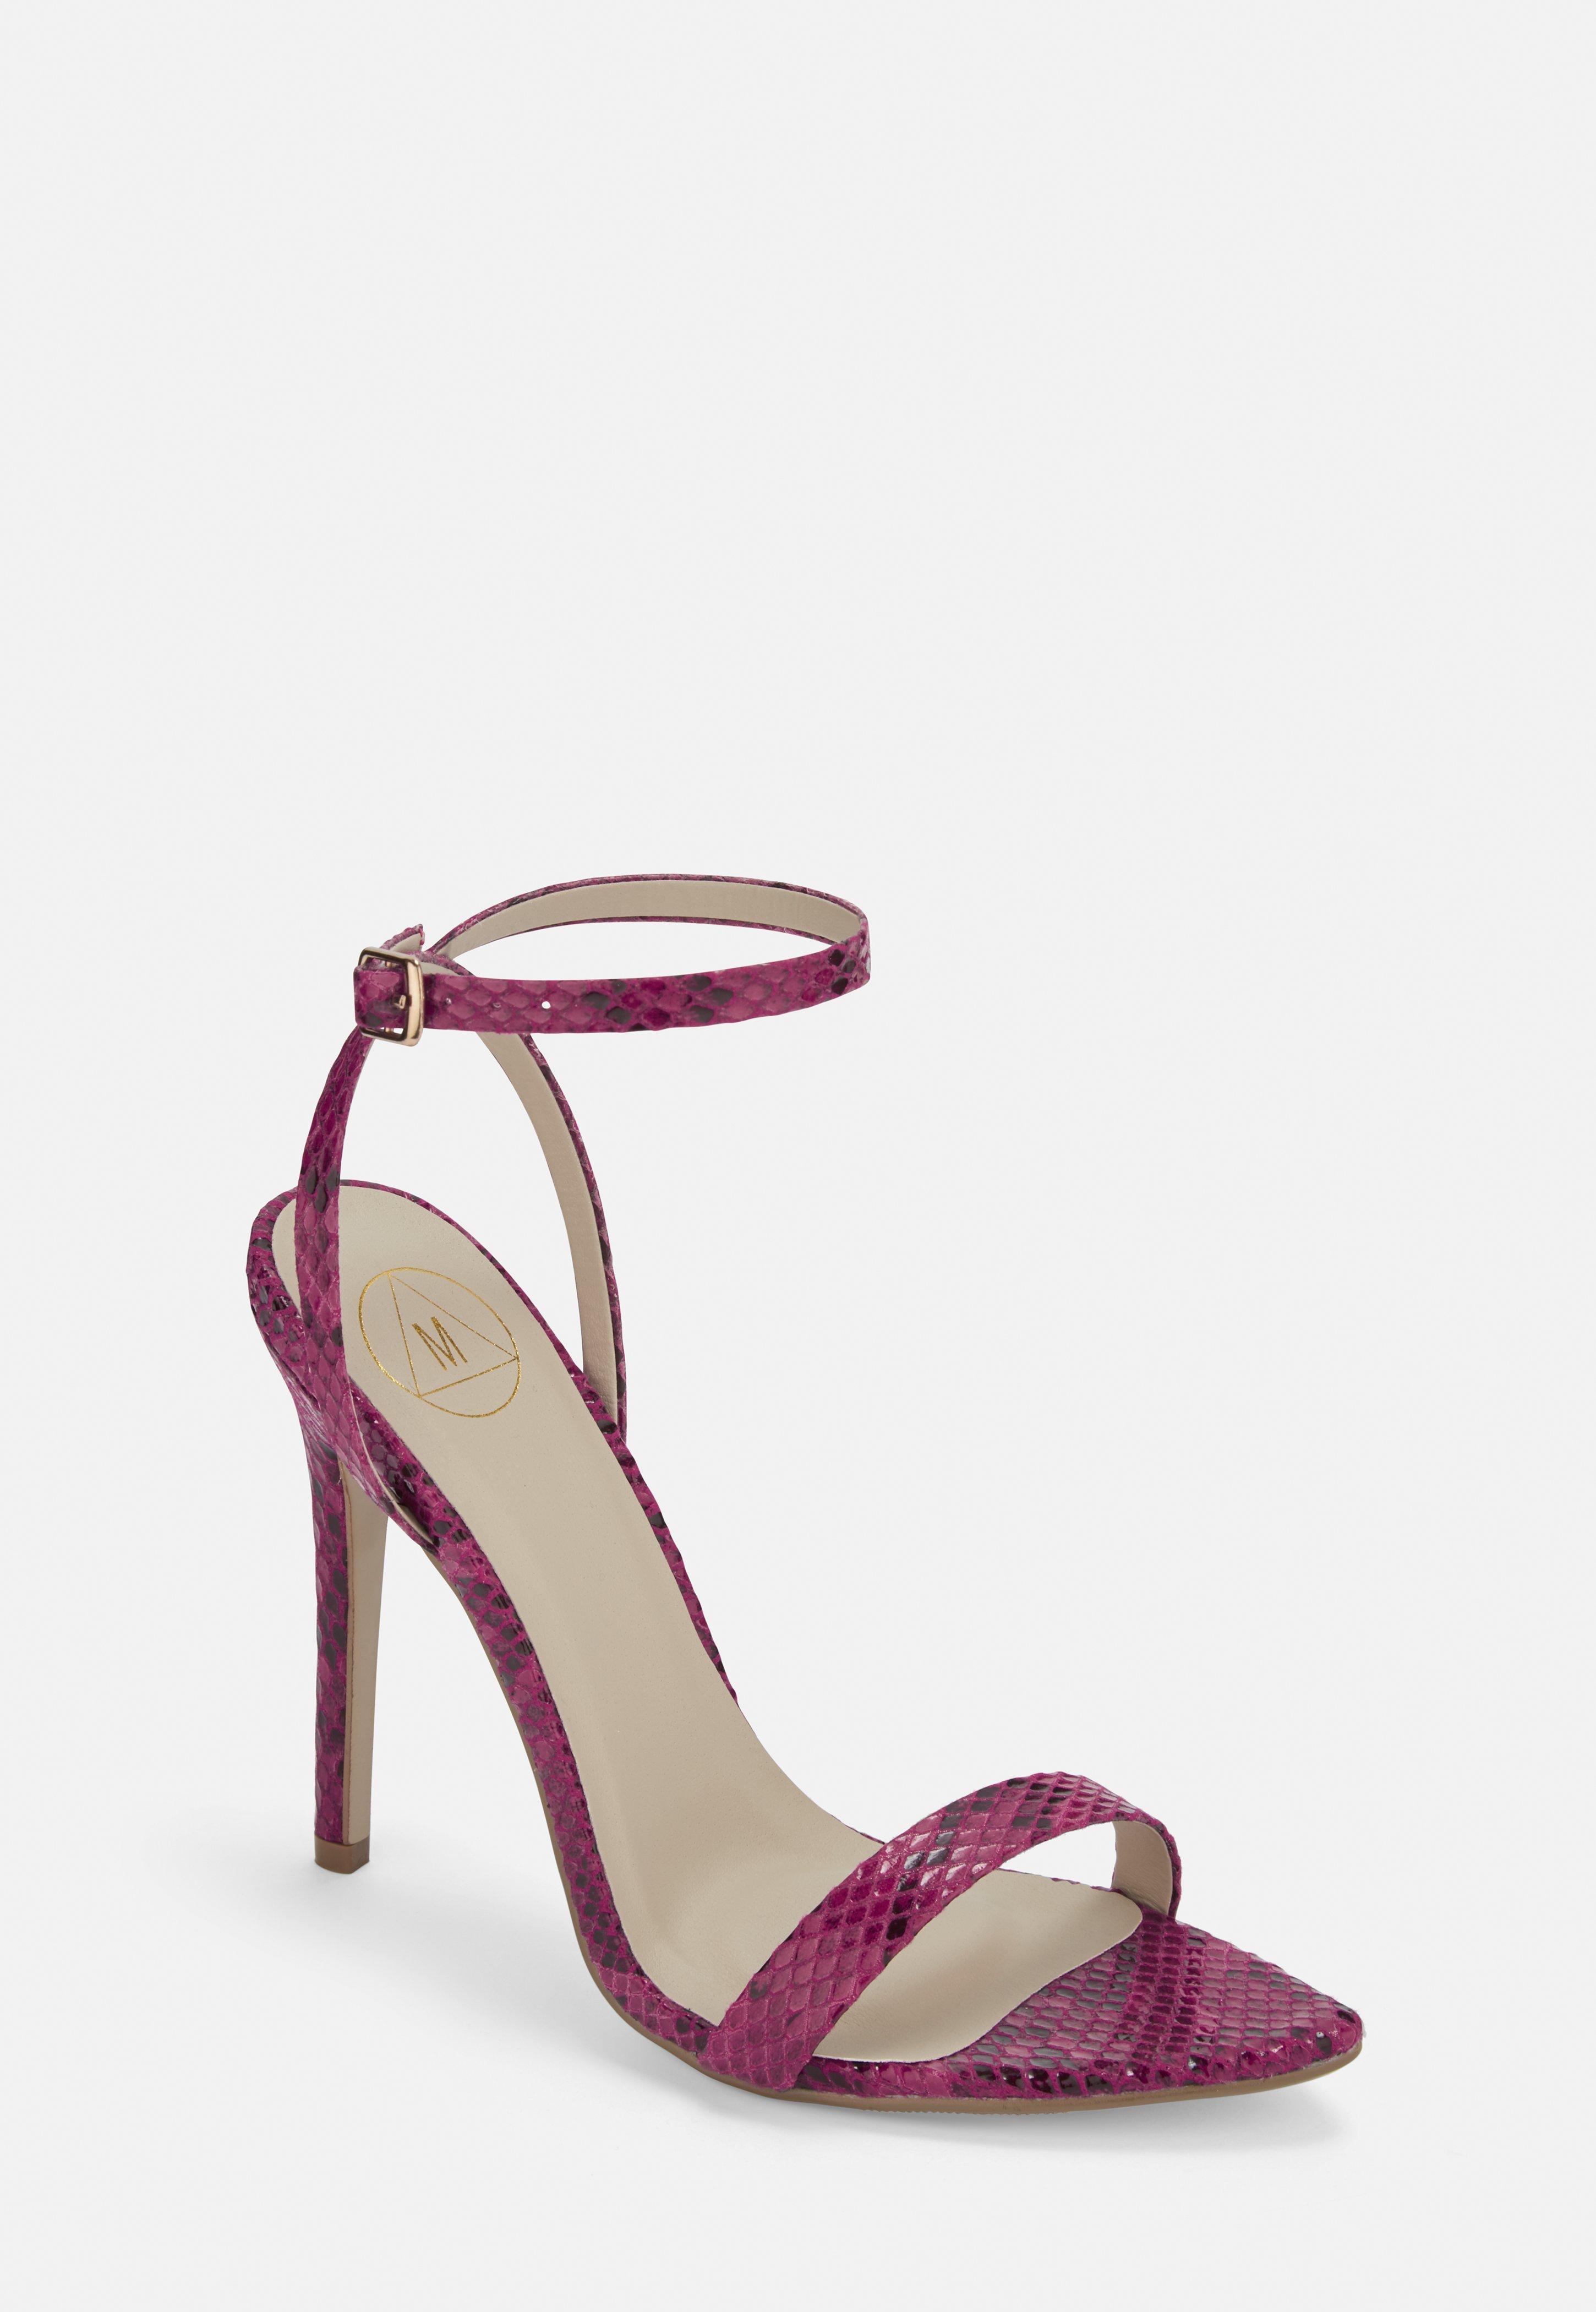 4772697eeee Raspberry Snake Print Pointed Toe Barely There Heels